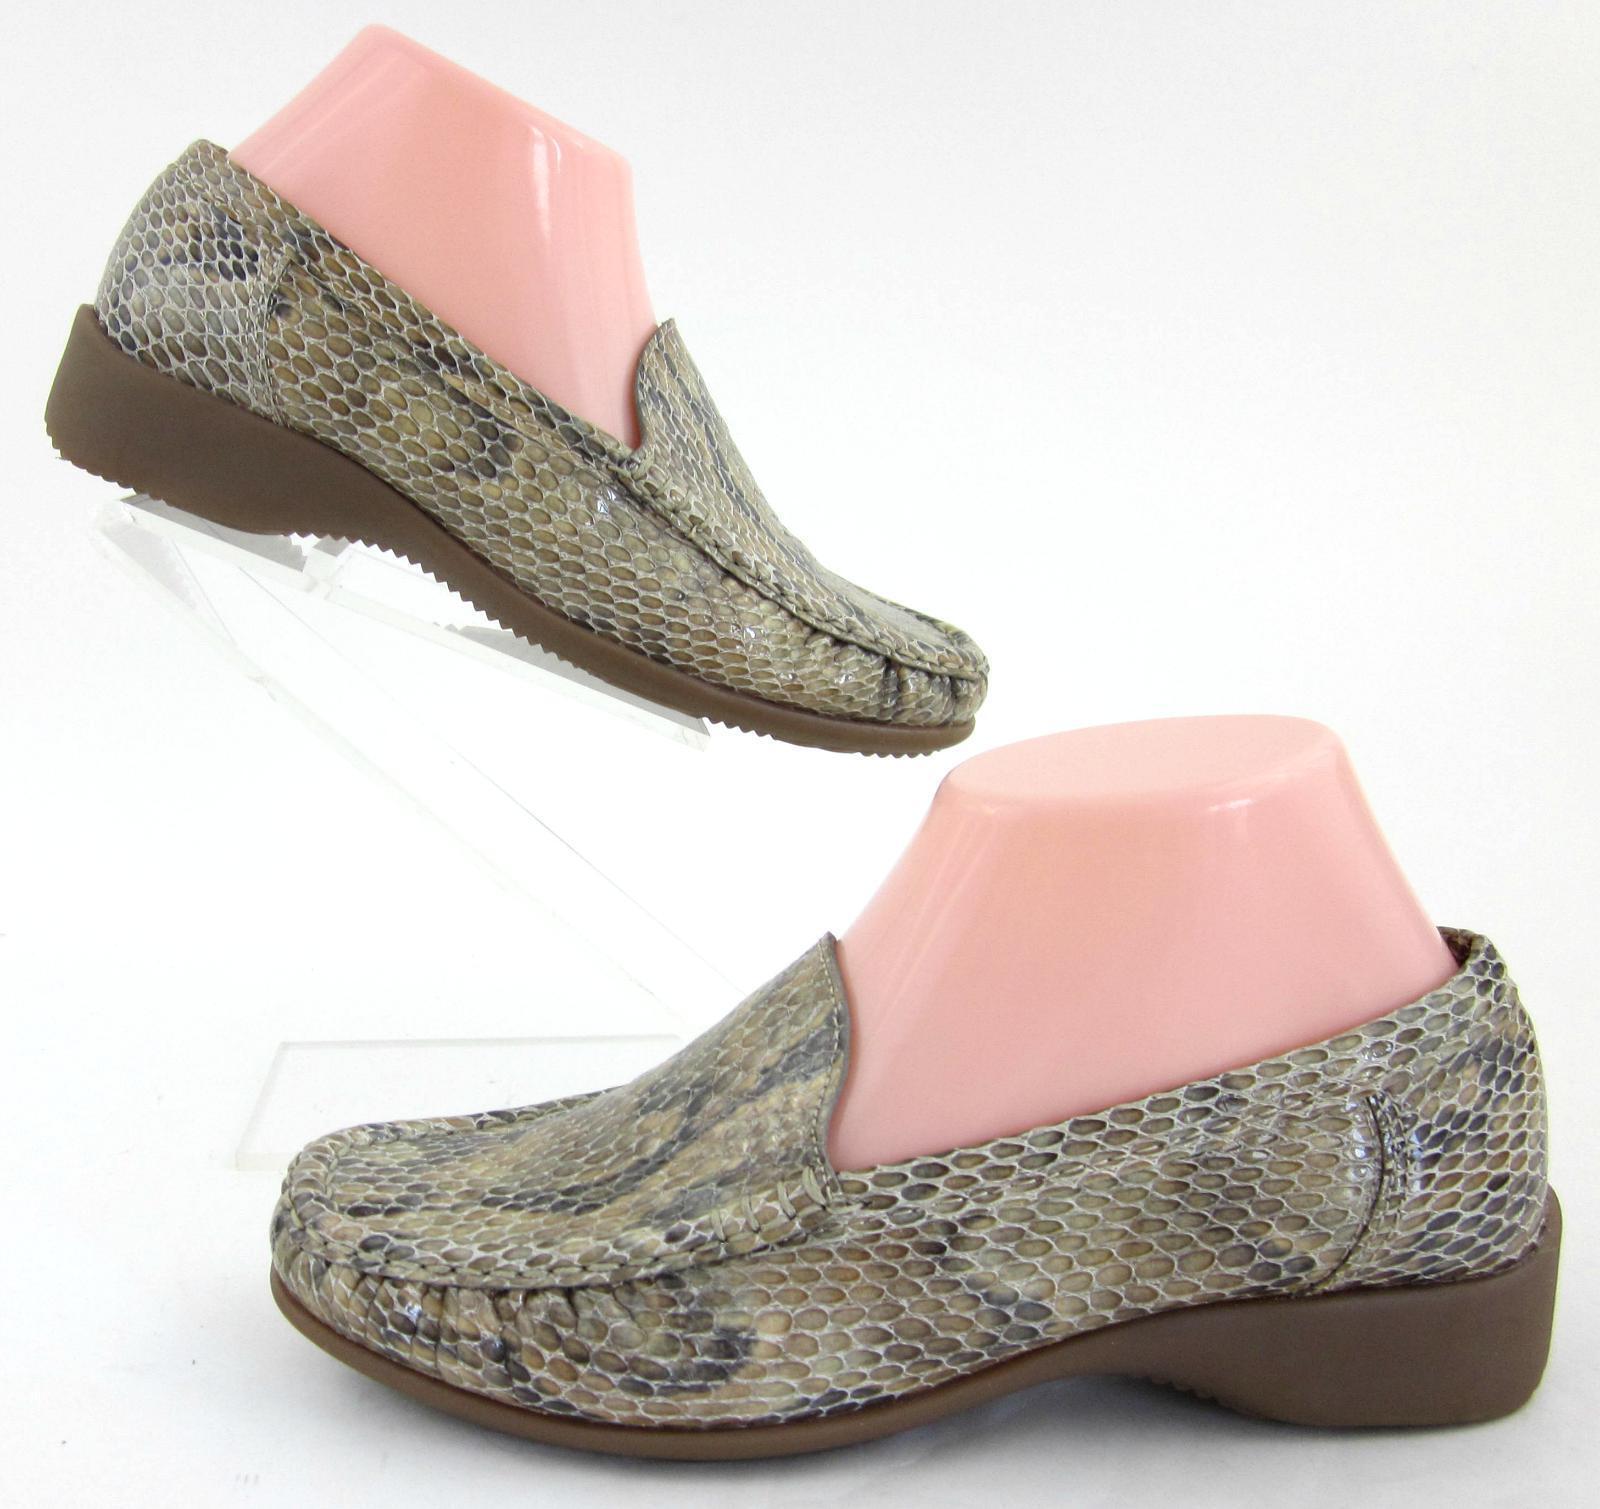 New! ARA Donna Slip On Loafers Tan Snake Print Patent Pelle US 6  165+